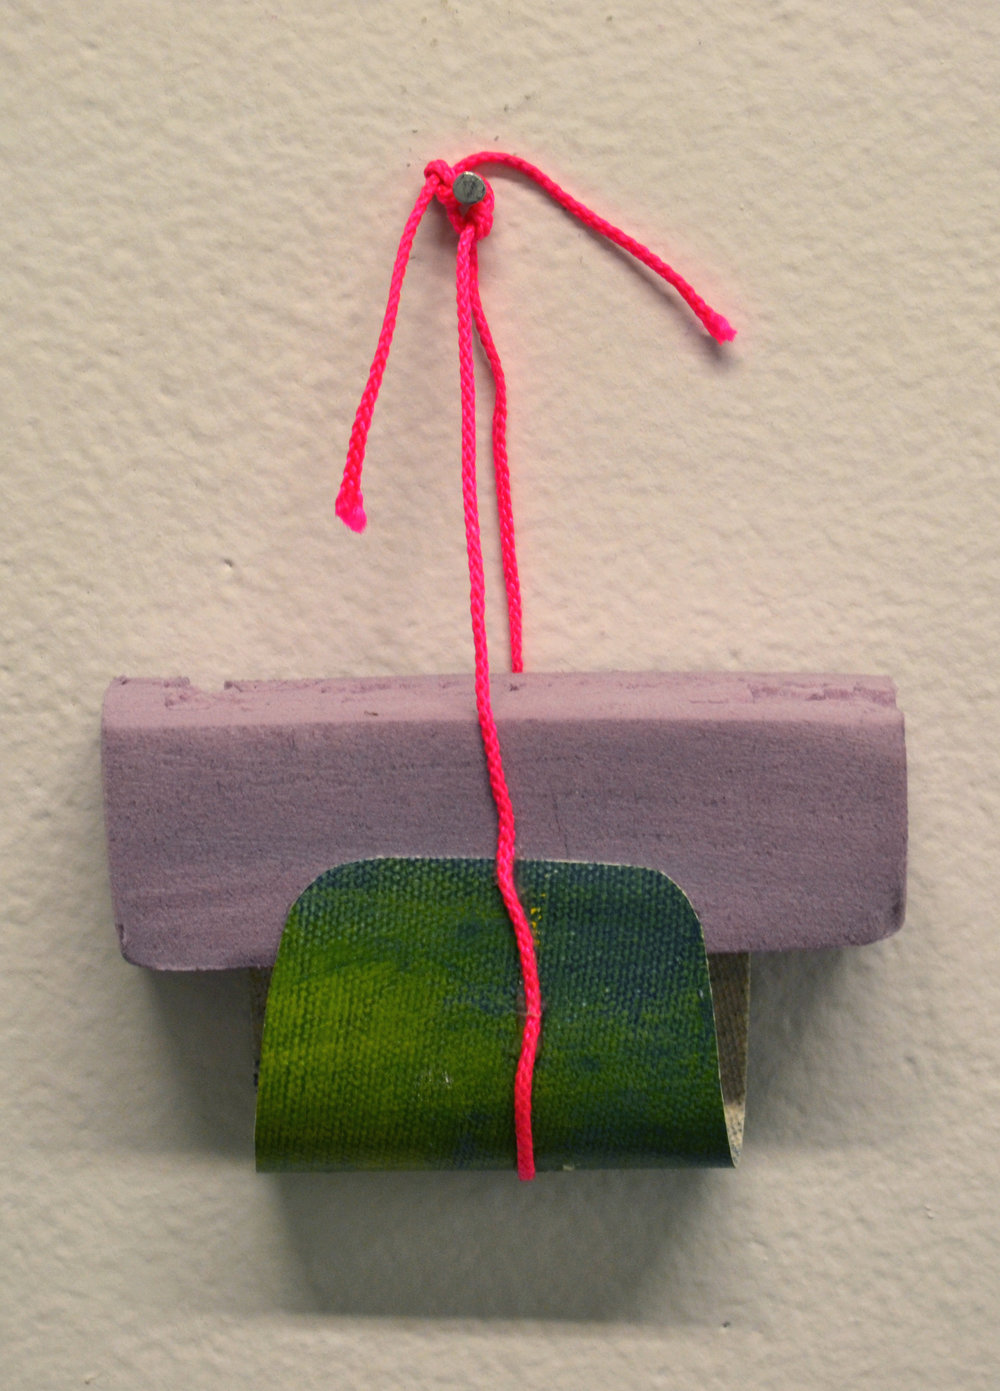 Insulation foam board, oil on canvas, and plastic cord.